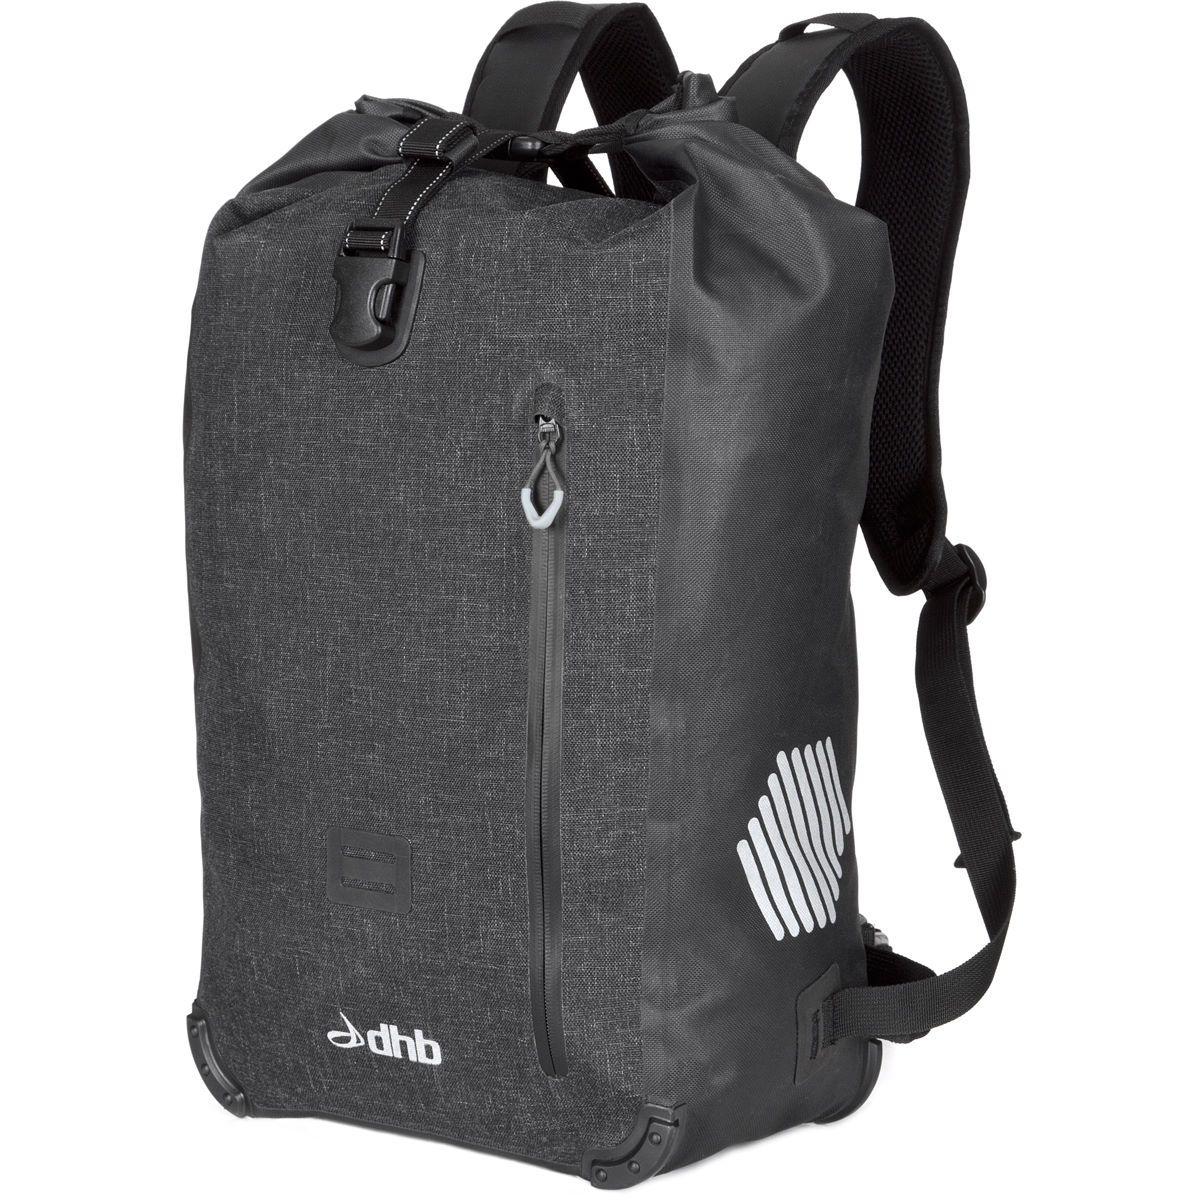 wiggle.com | dhb Waterproof Rucksack 25L | Backpacks